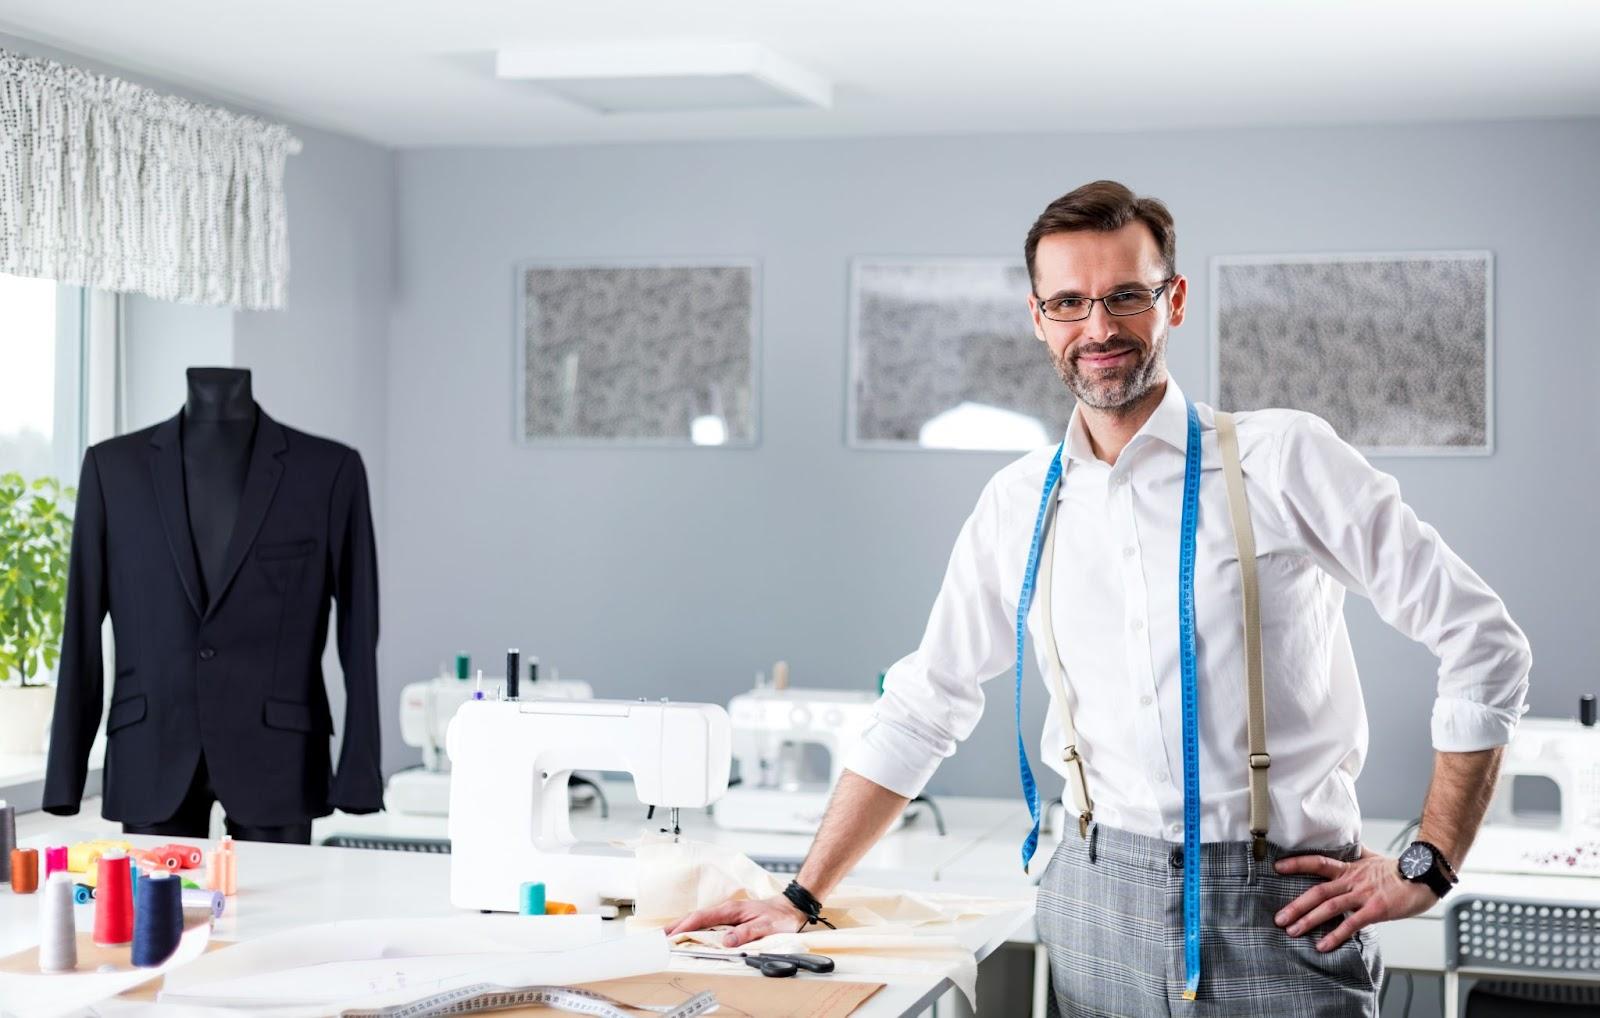 Male fashion designer working